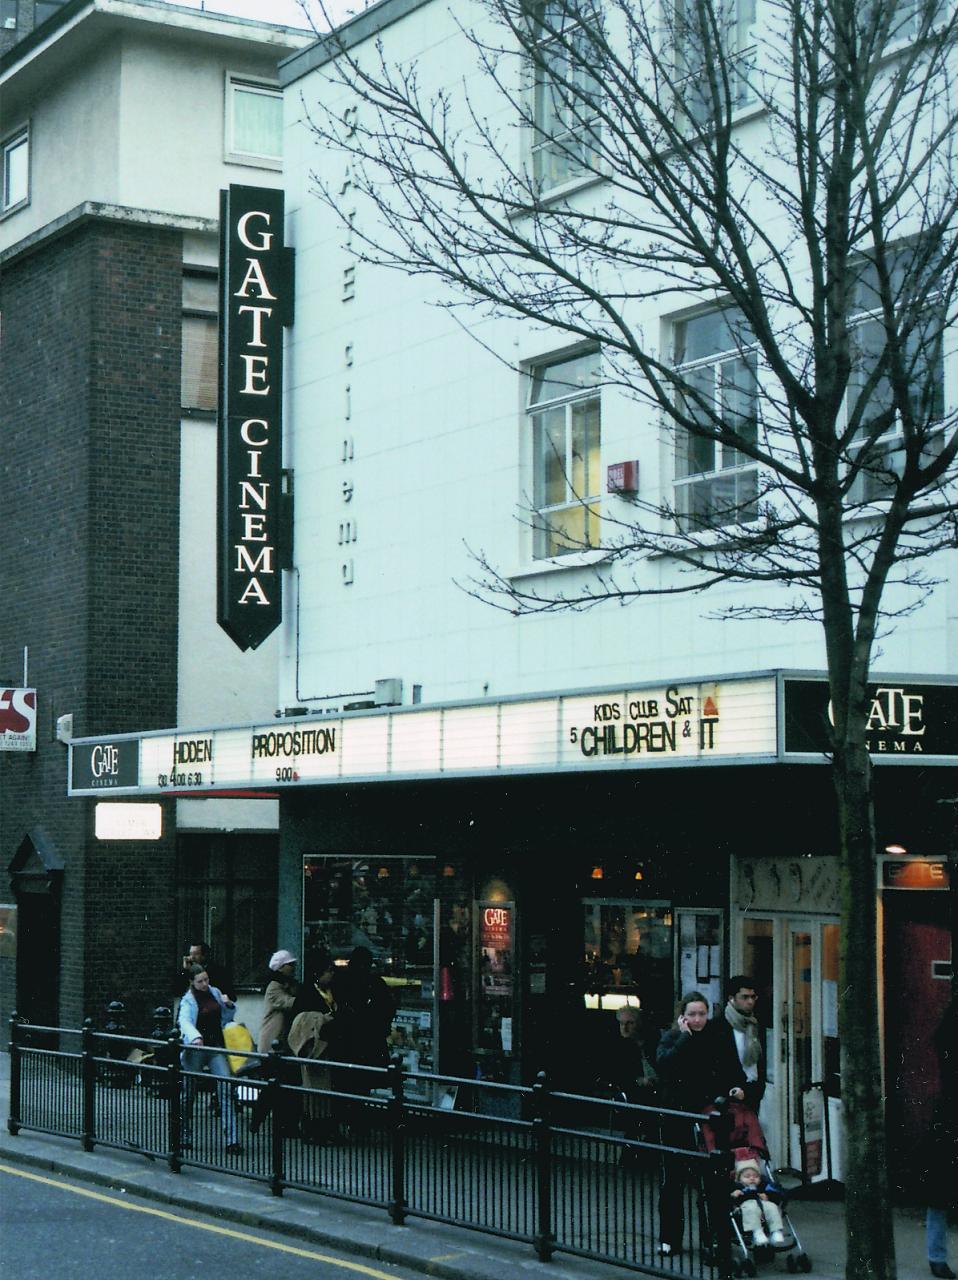 Gate Cinema, Notting Hill